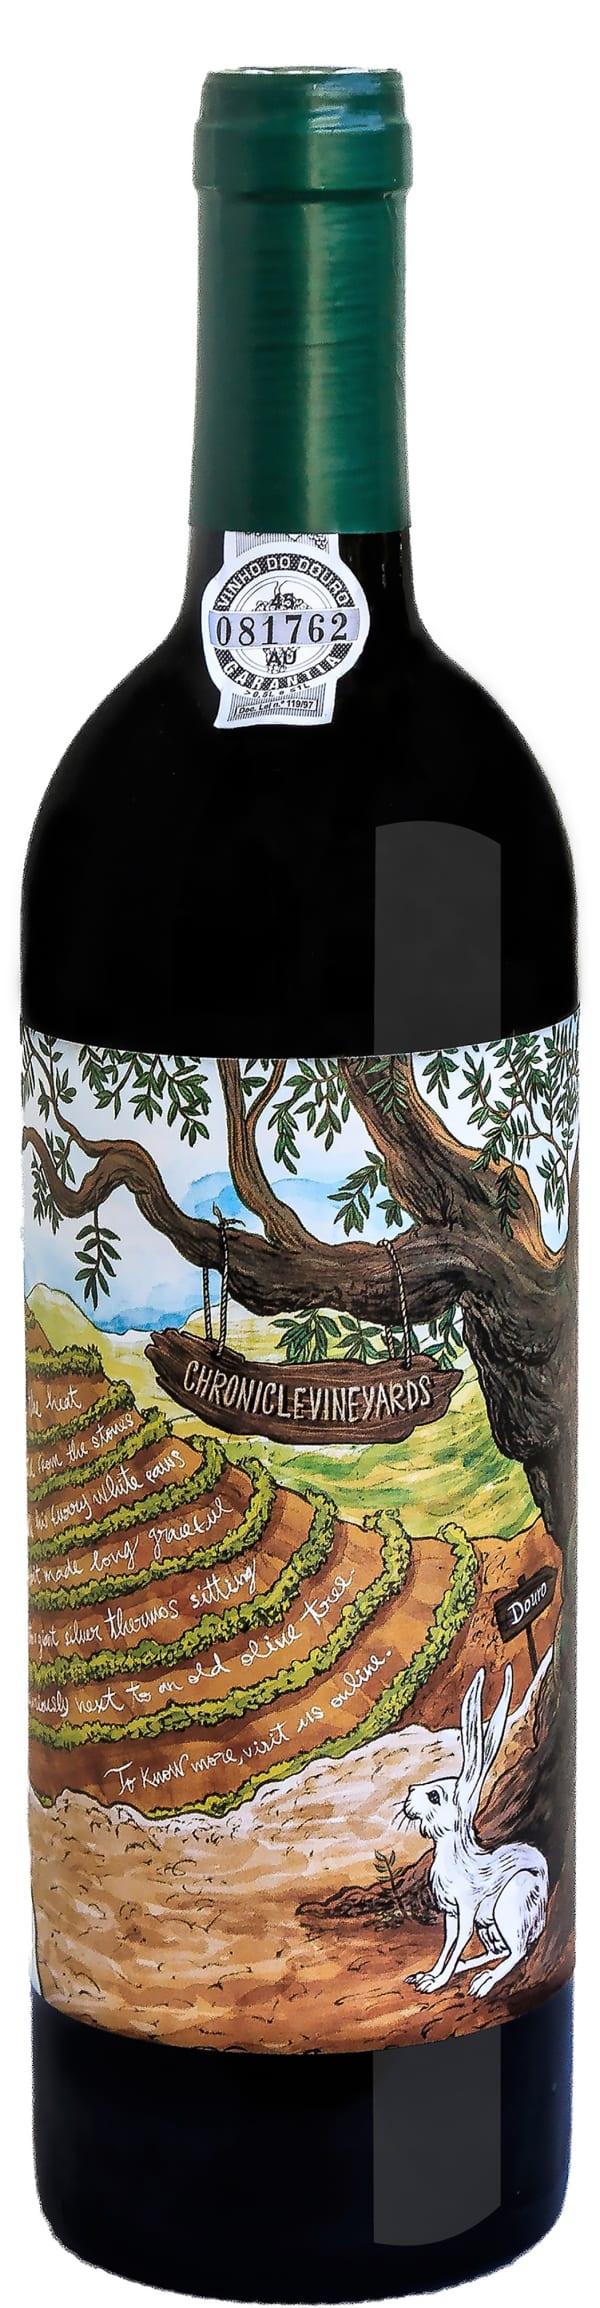 Chronicle Vineyards Douro Red 2015